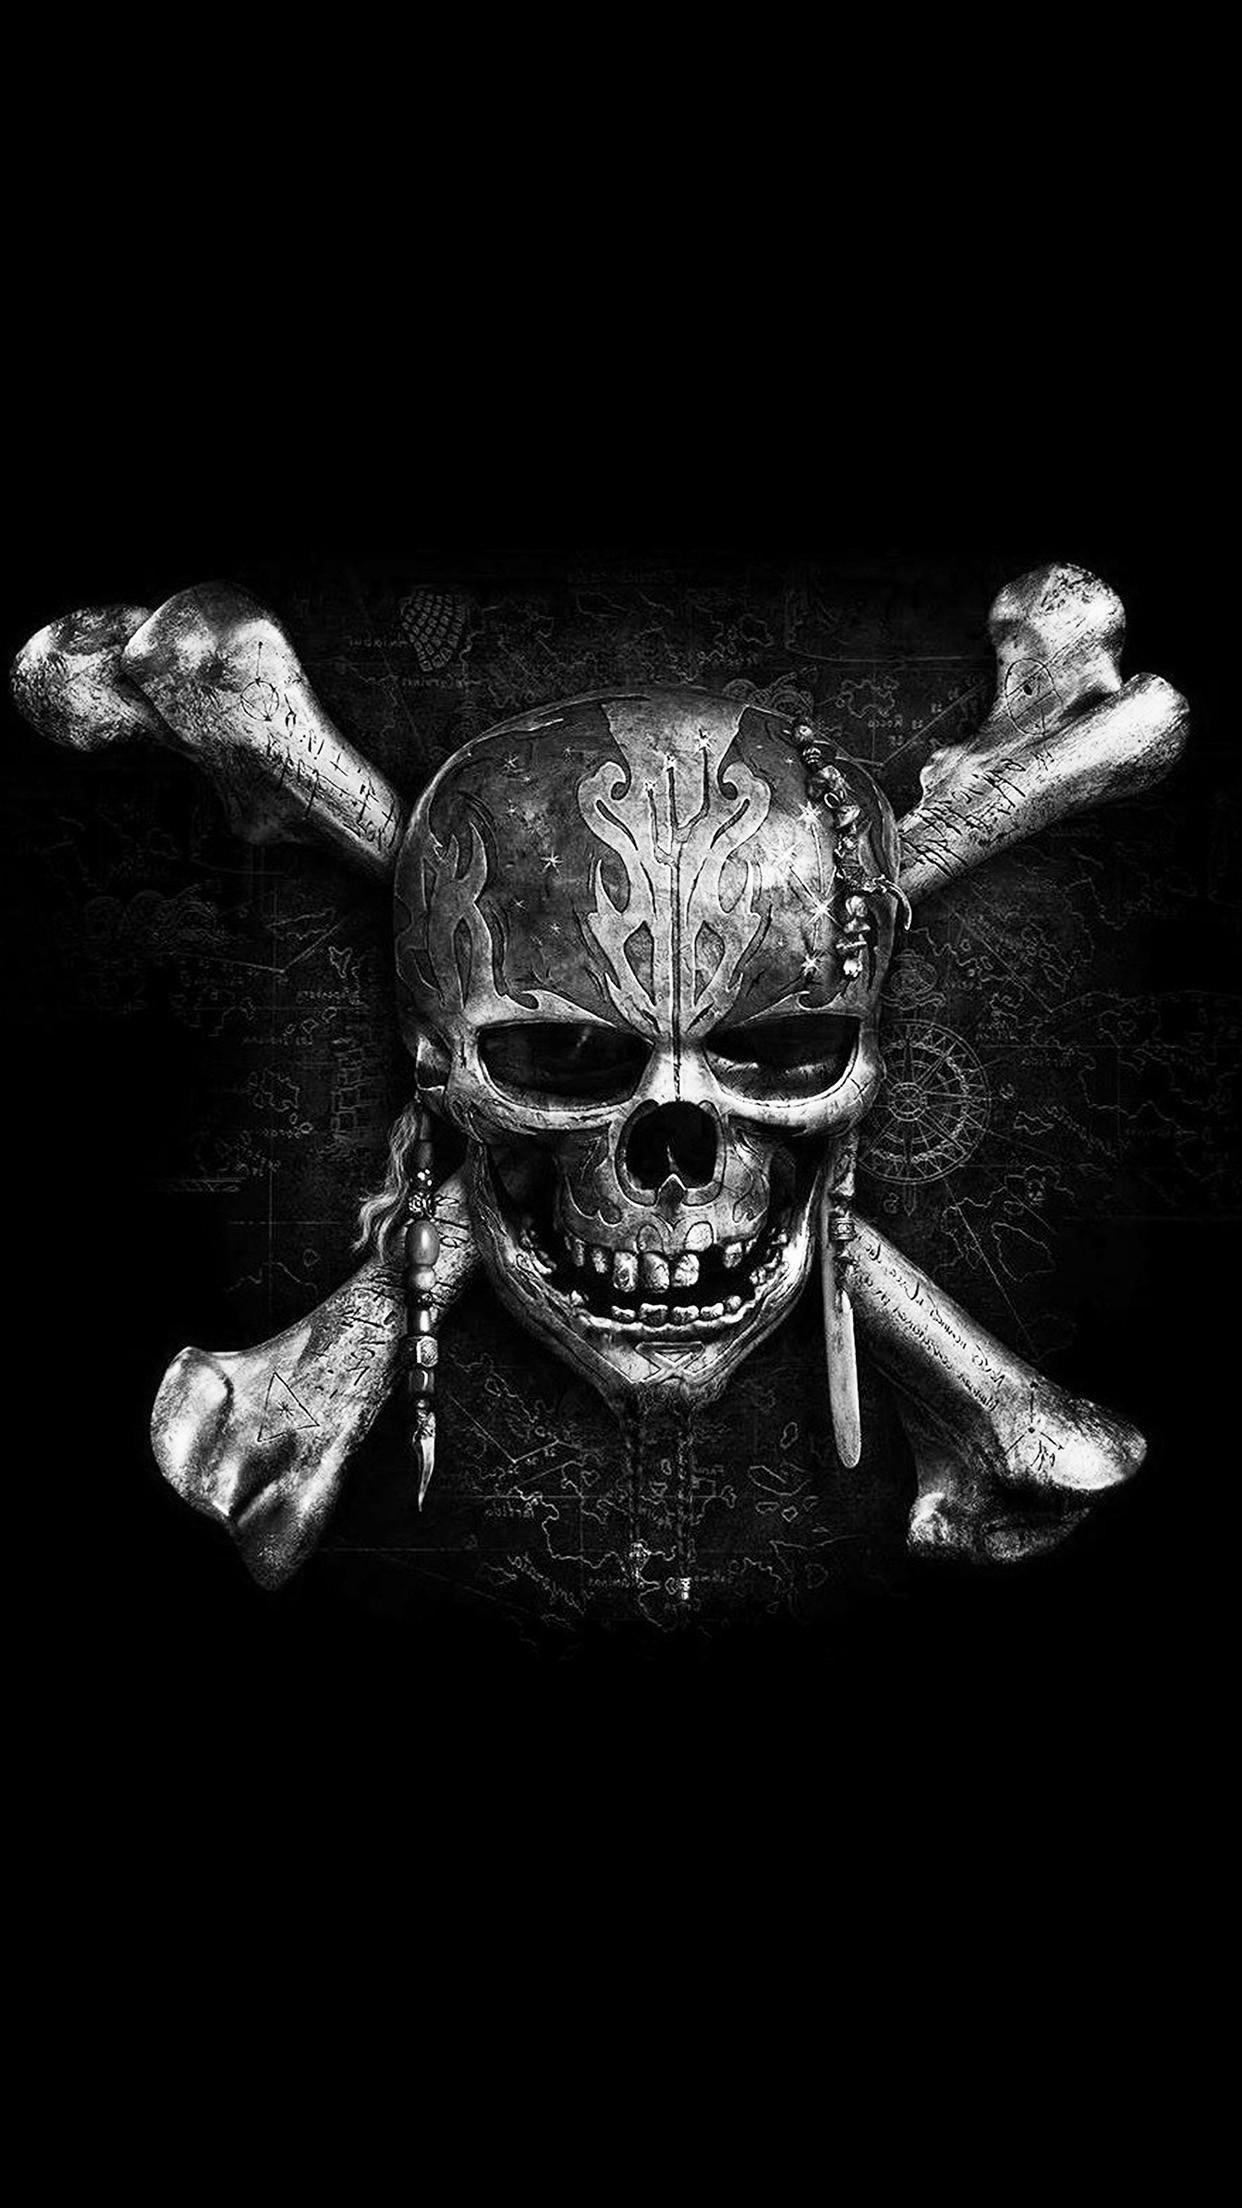 Pirate Skull Wallpaper 66 Images